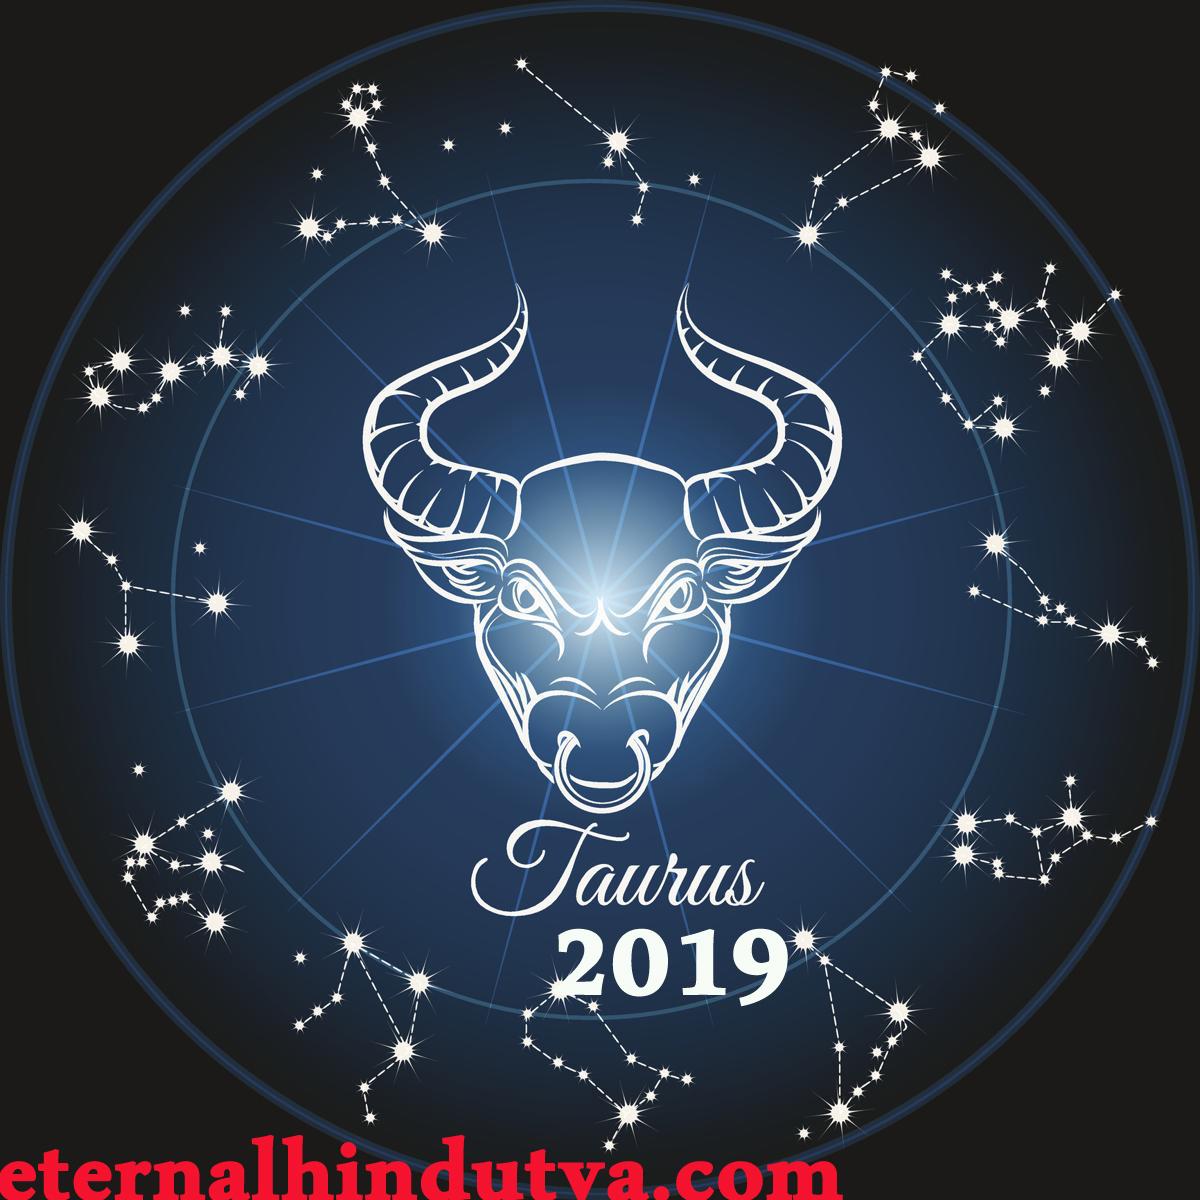 Taurus Horoscope 2019 - Science and Hindu Religion